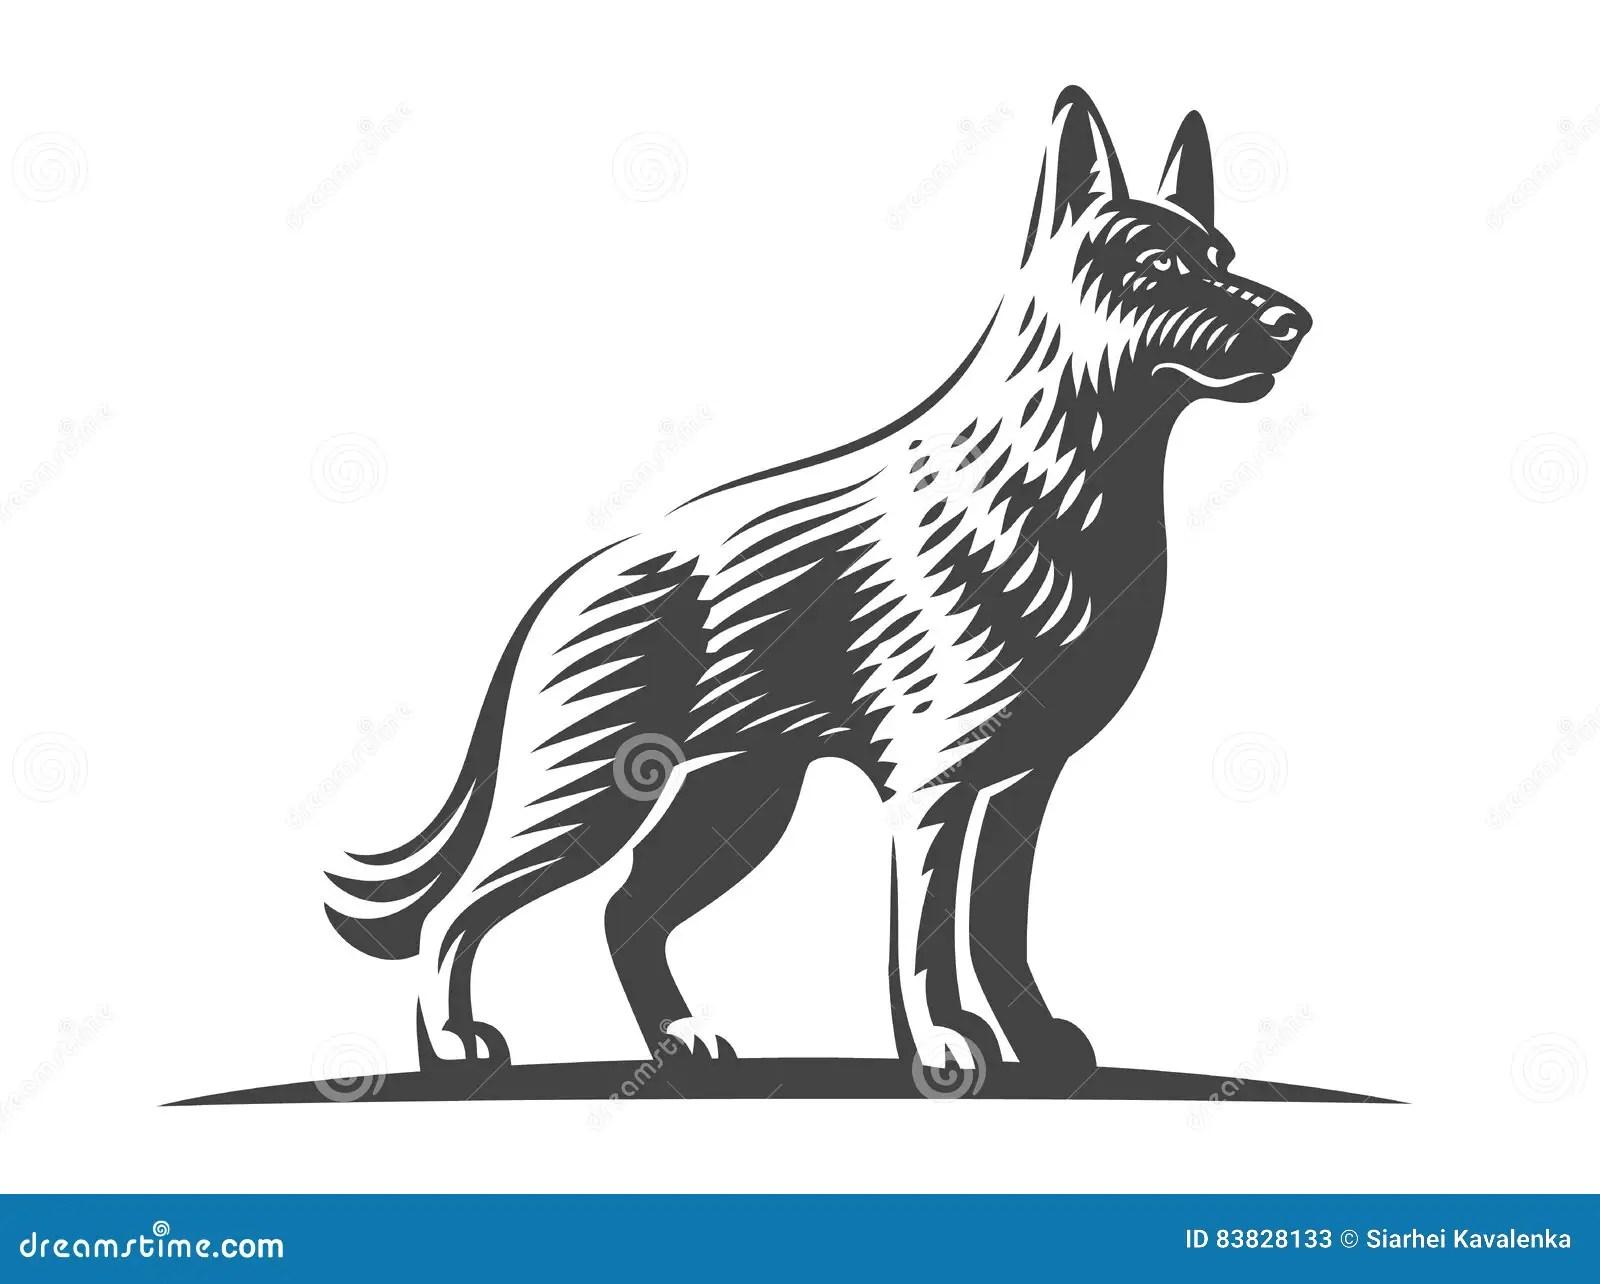 Sheepdog Cartoons Illustrations Amp Vector Stock Images